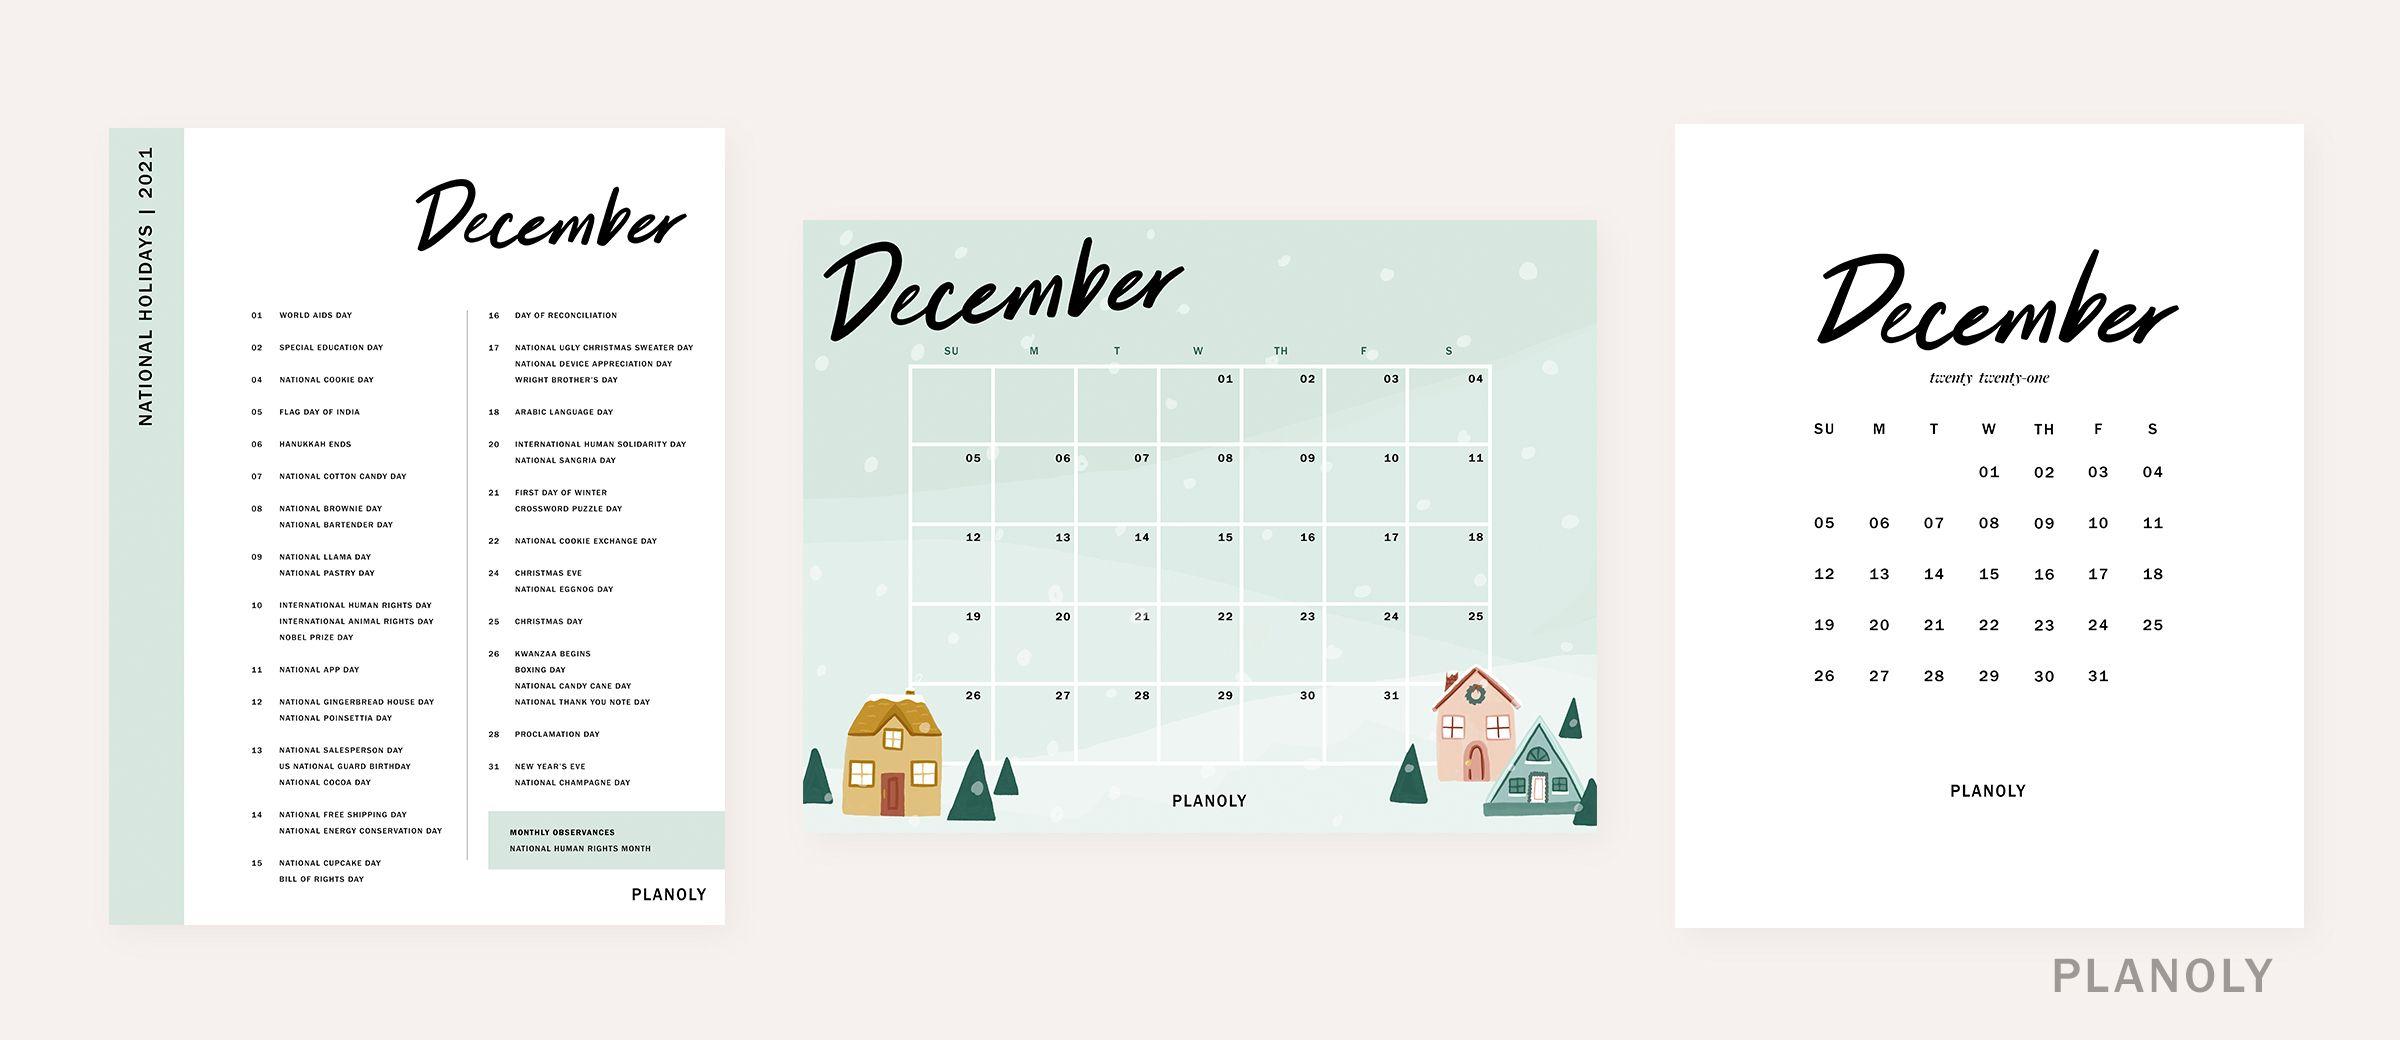 PLANOLY-Q4 Content Calendars-Image 3